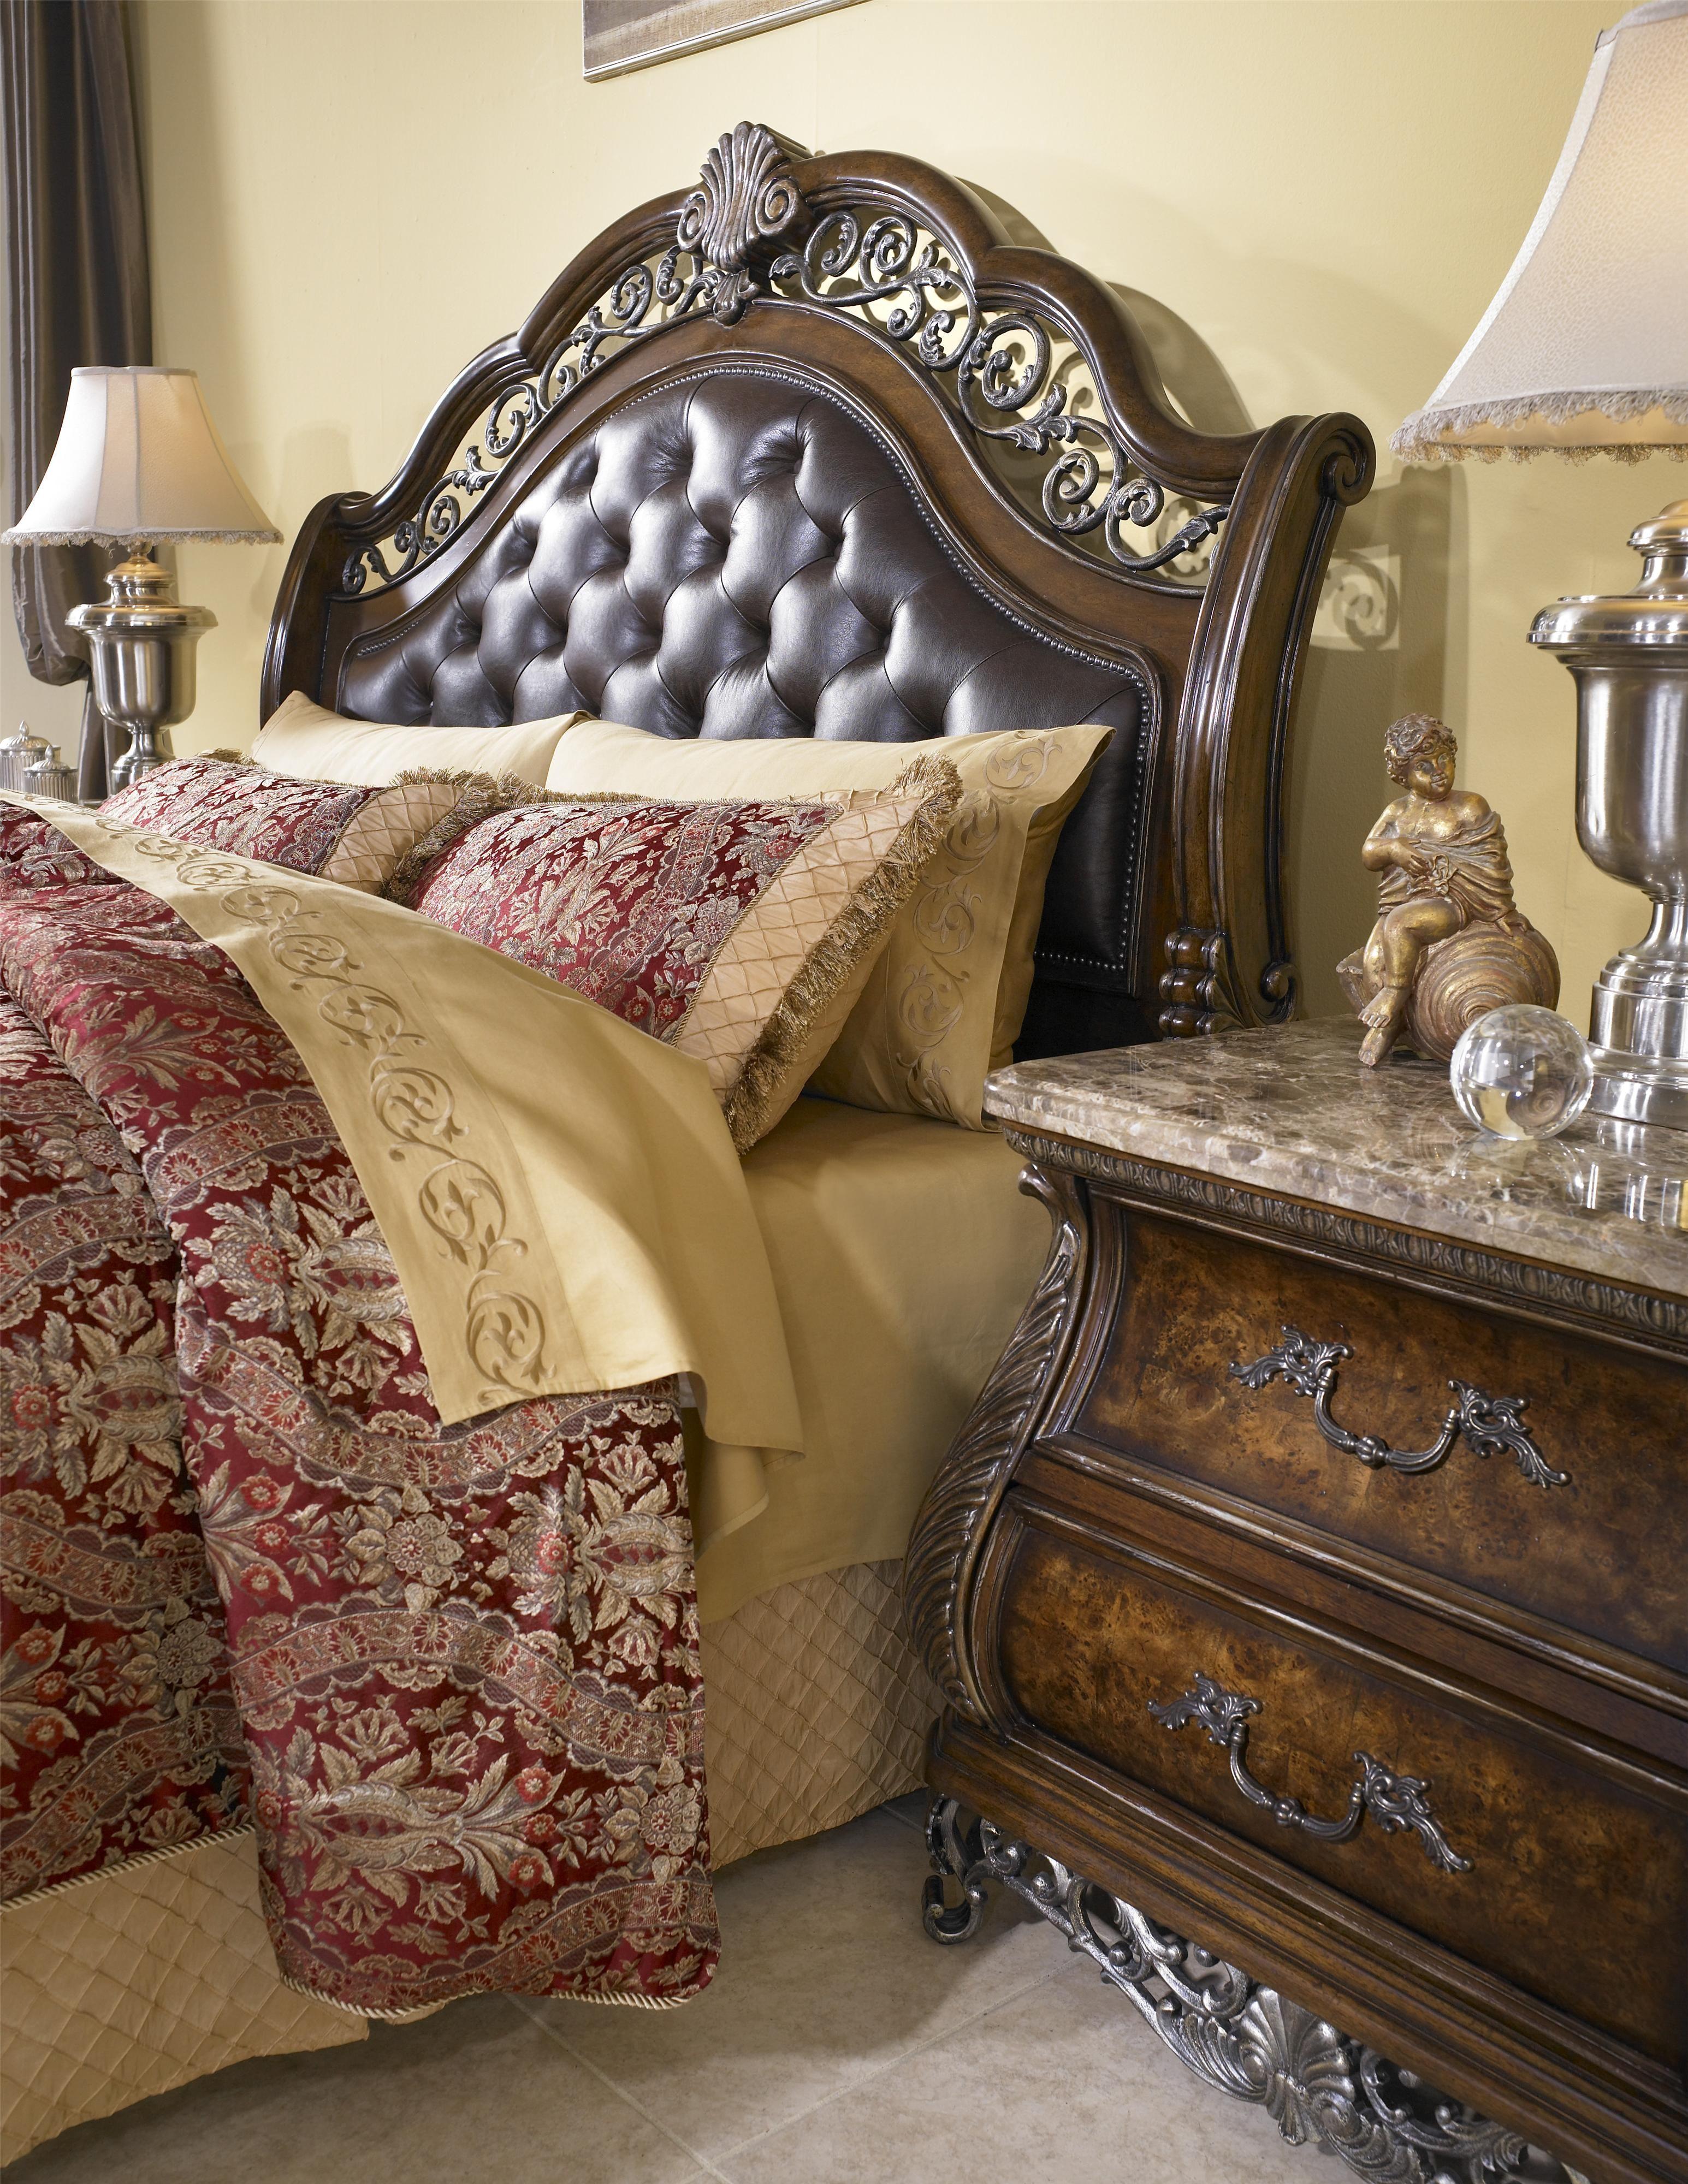 Birkhaven King Sleigh Bed By Pulaski Furniture At Wayside Furniture Furniture Queen Sleigh Bed Tufted Headboard Bed